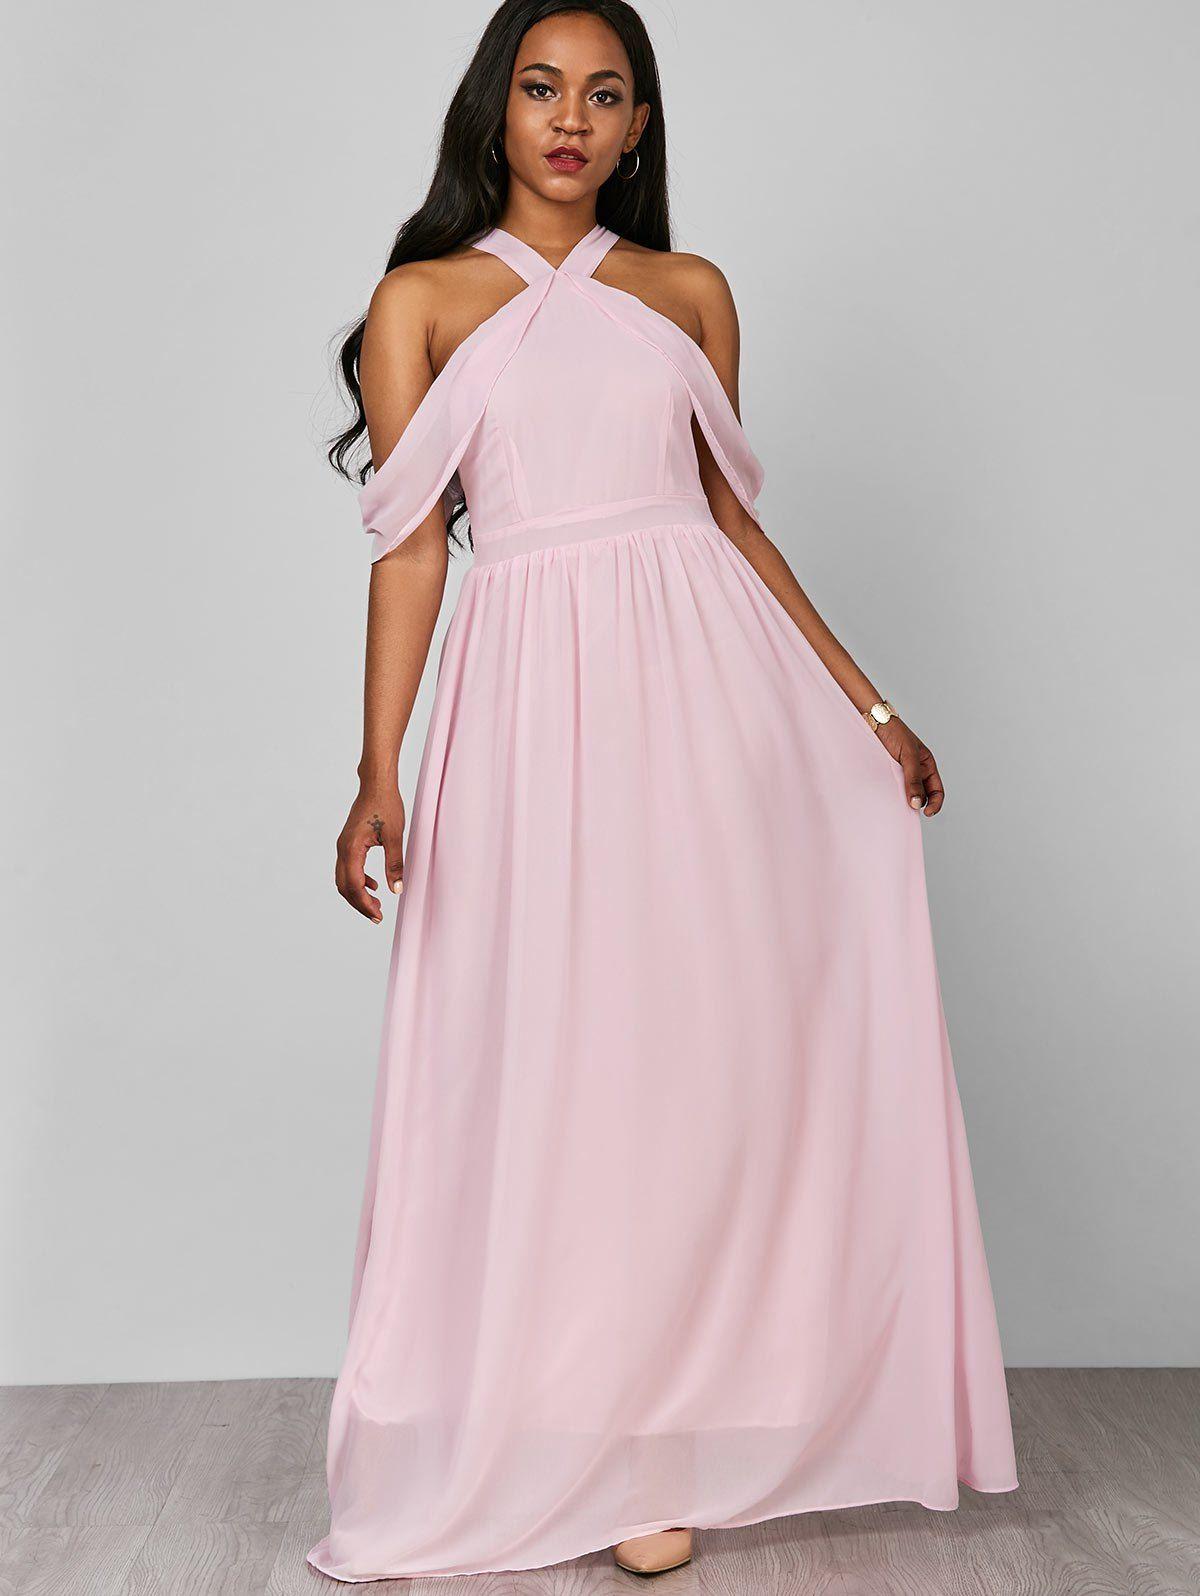 Cold Shoulder Flounce Chiffon Pastel Maxi Dress Ad ,